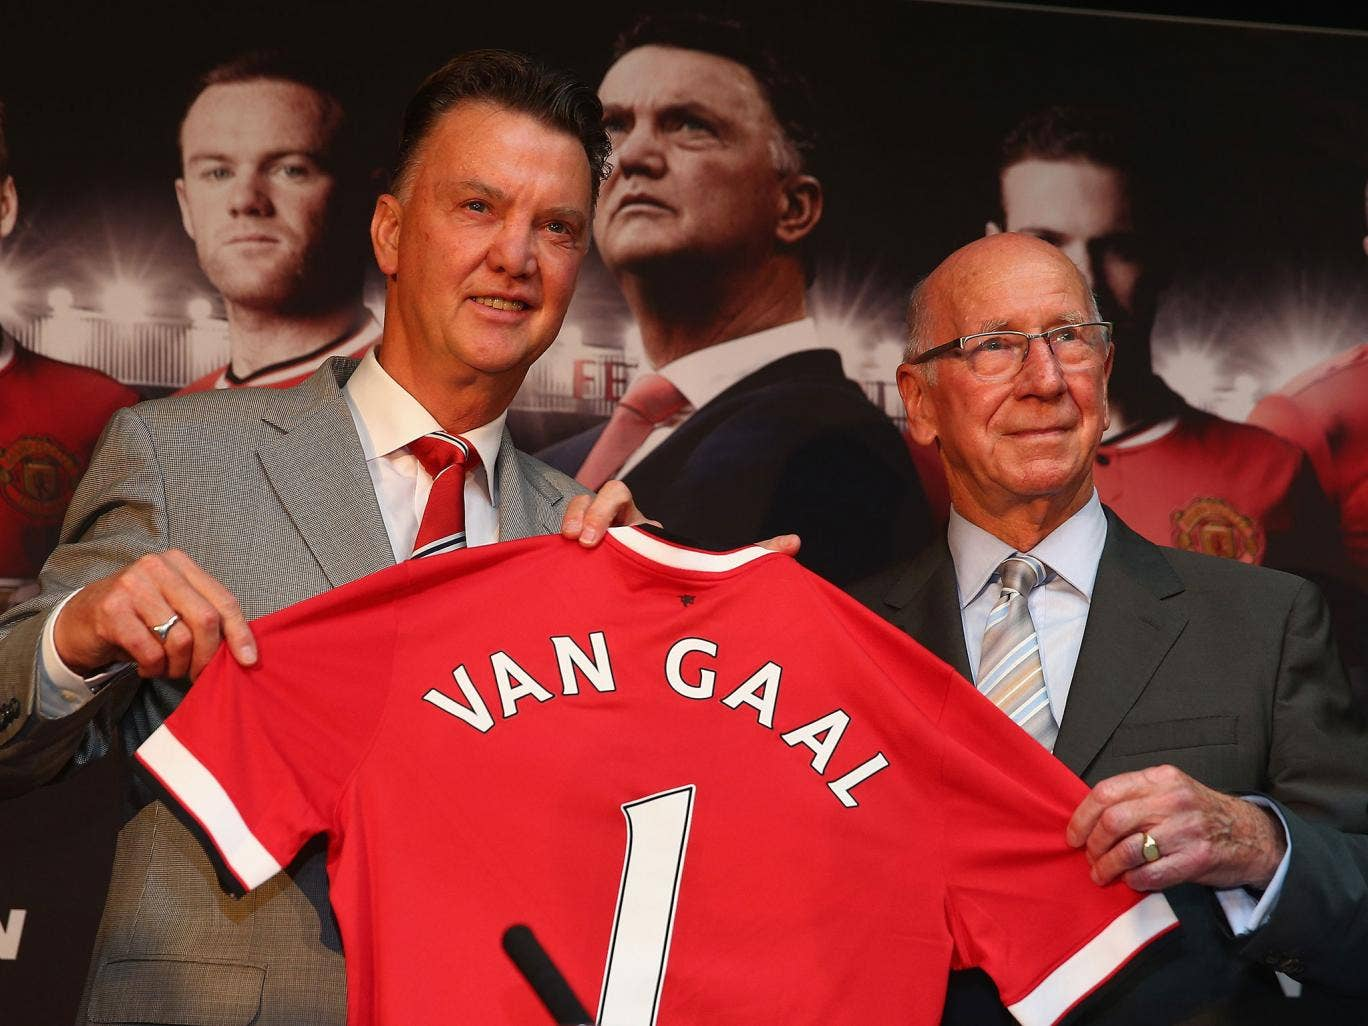 Louis van Gaal is unveiled at Manchester United alongside club ambassador Sir Bobby Charlton